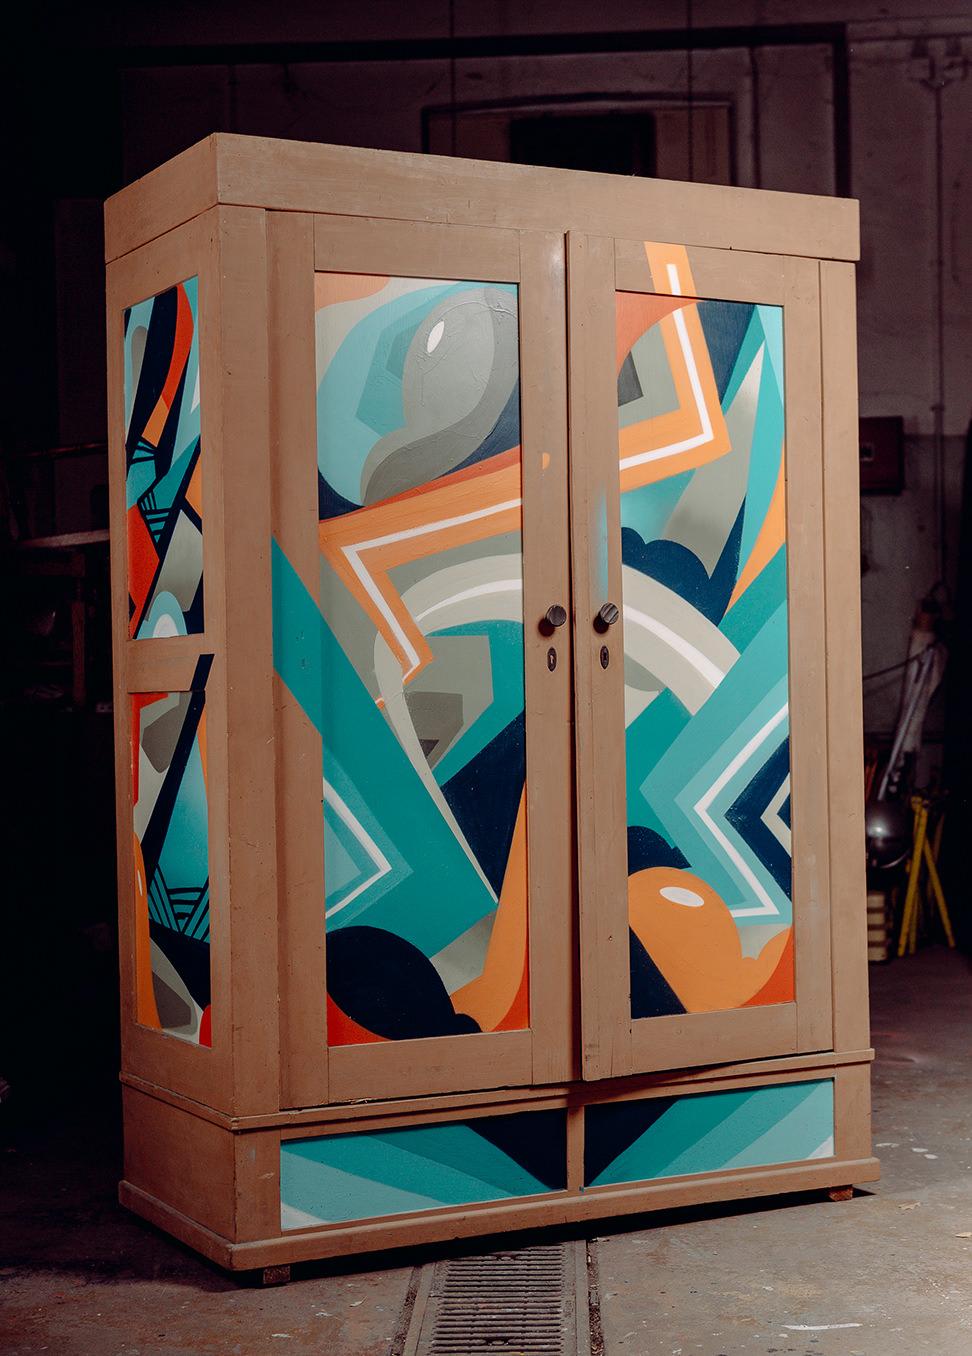 ohpardon-graffiti-furniture-streetart-custom-furniture-04-2019_mg_0609